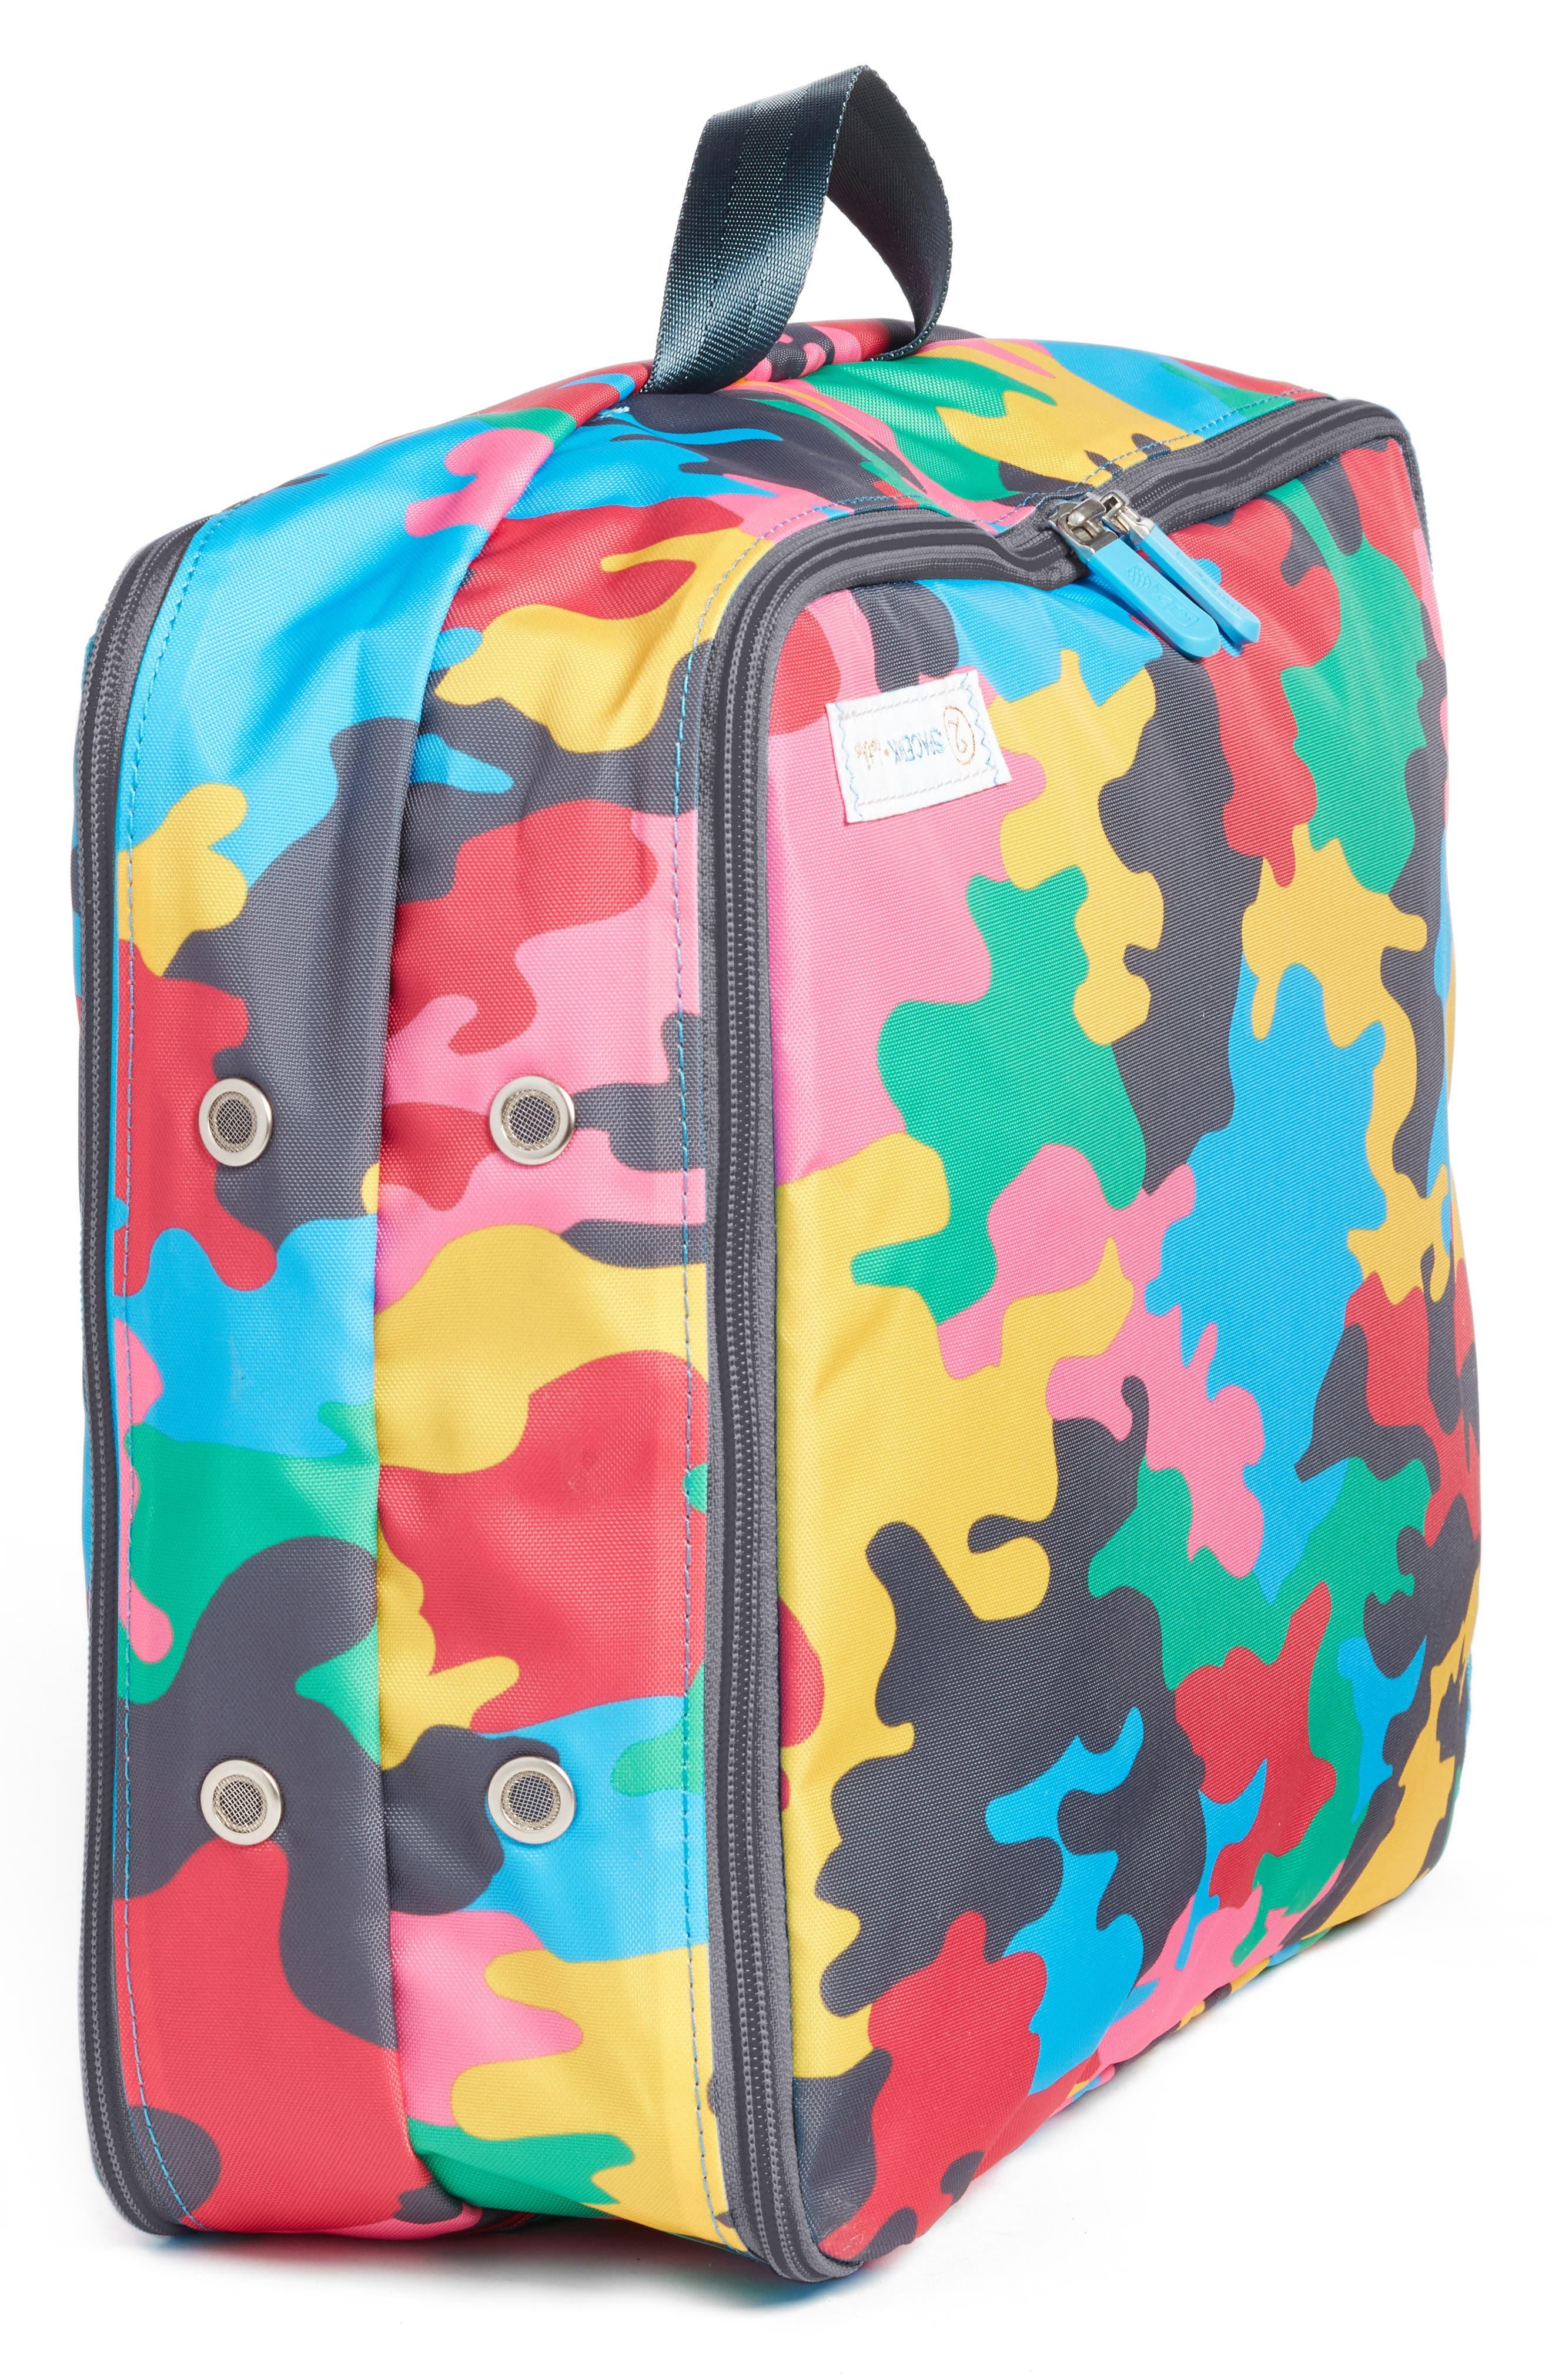 Alternate Image 4  - Flight 001 Spacepak Packing Compression Bag Set